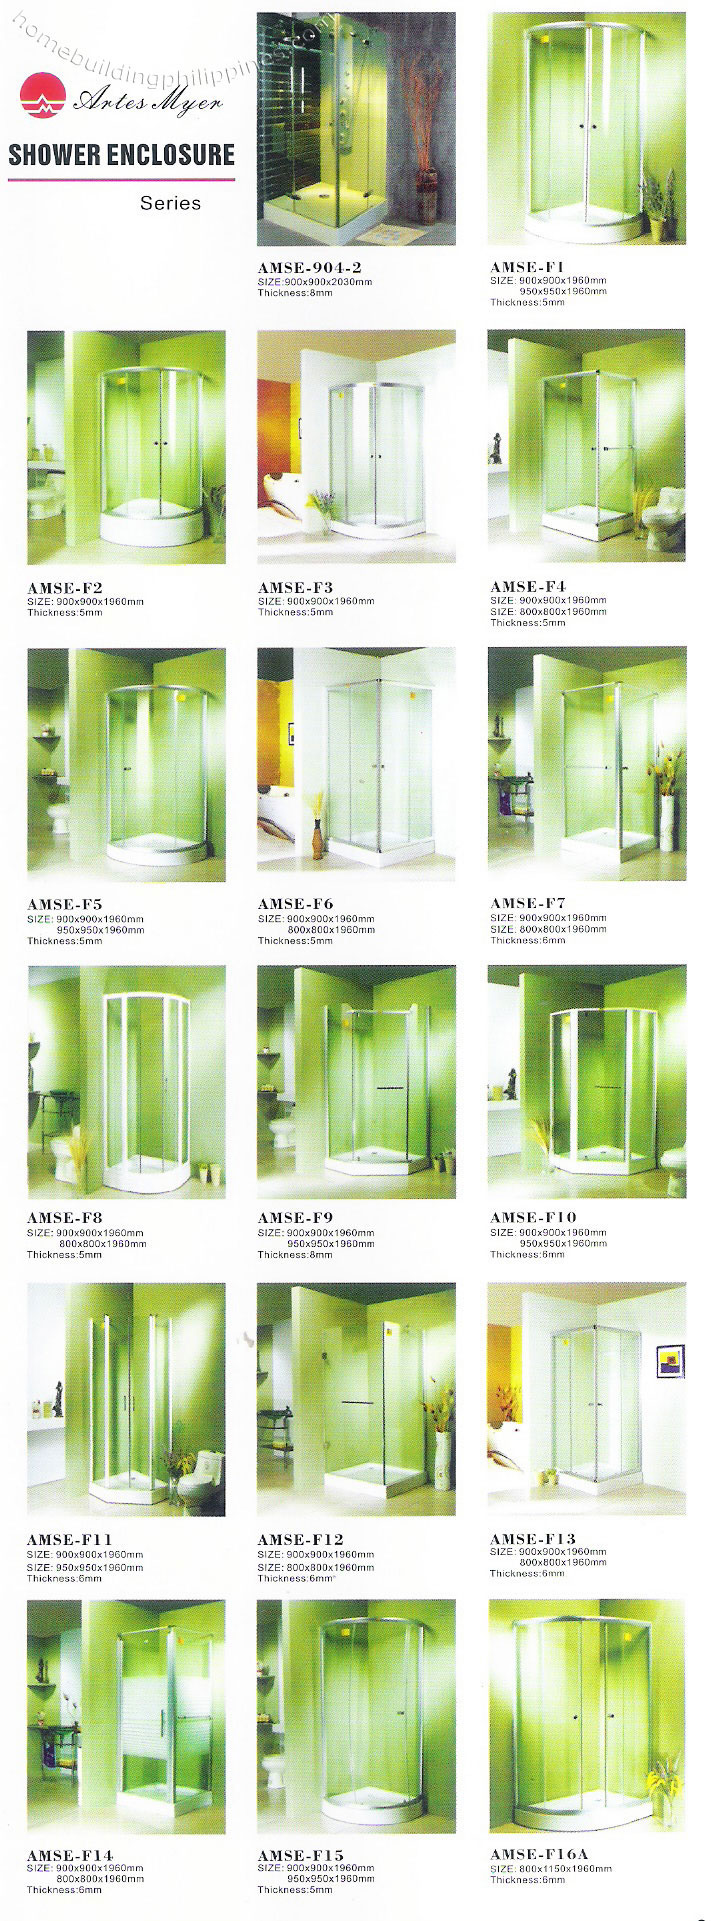 Myer bathroom accessories - Shower Enclosure